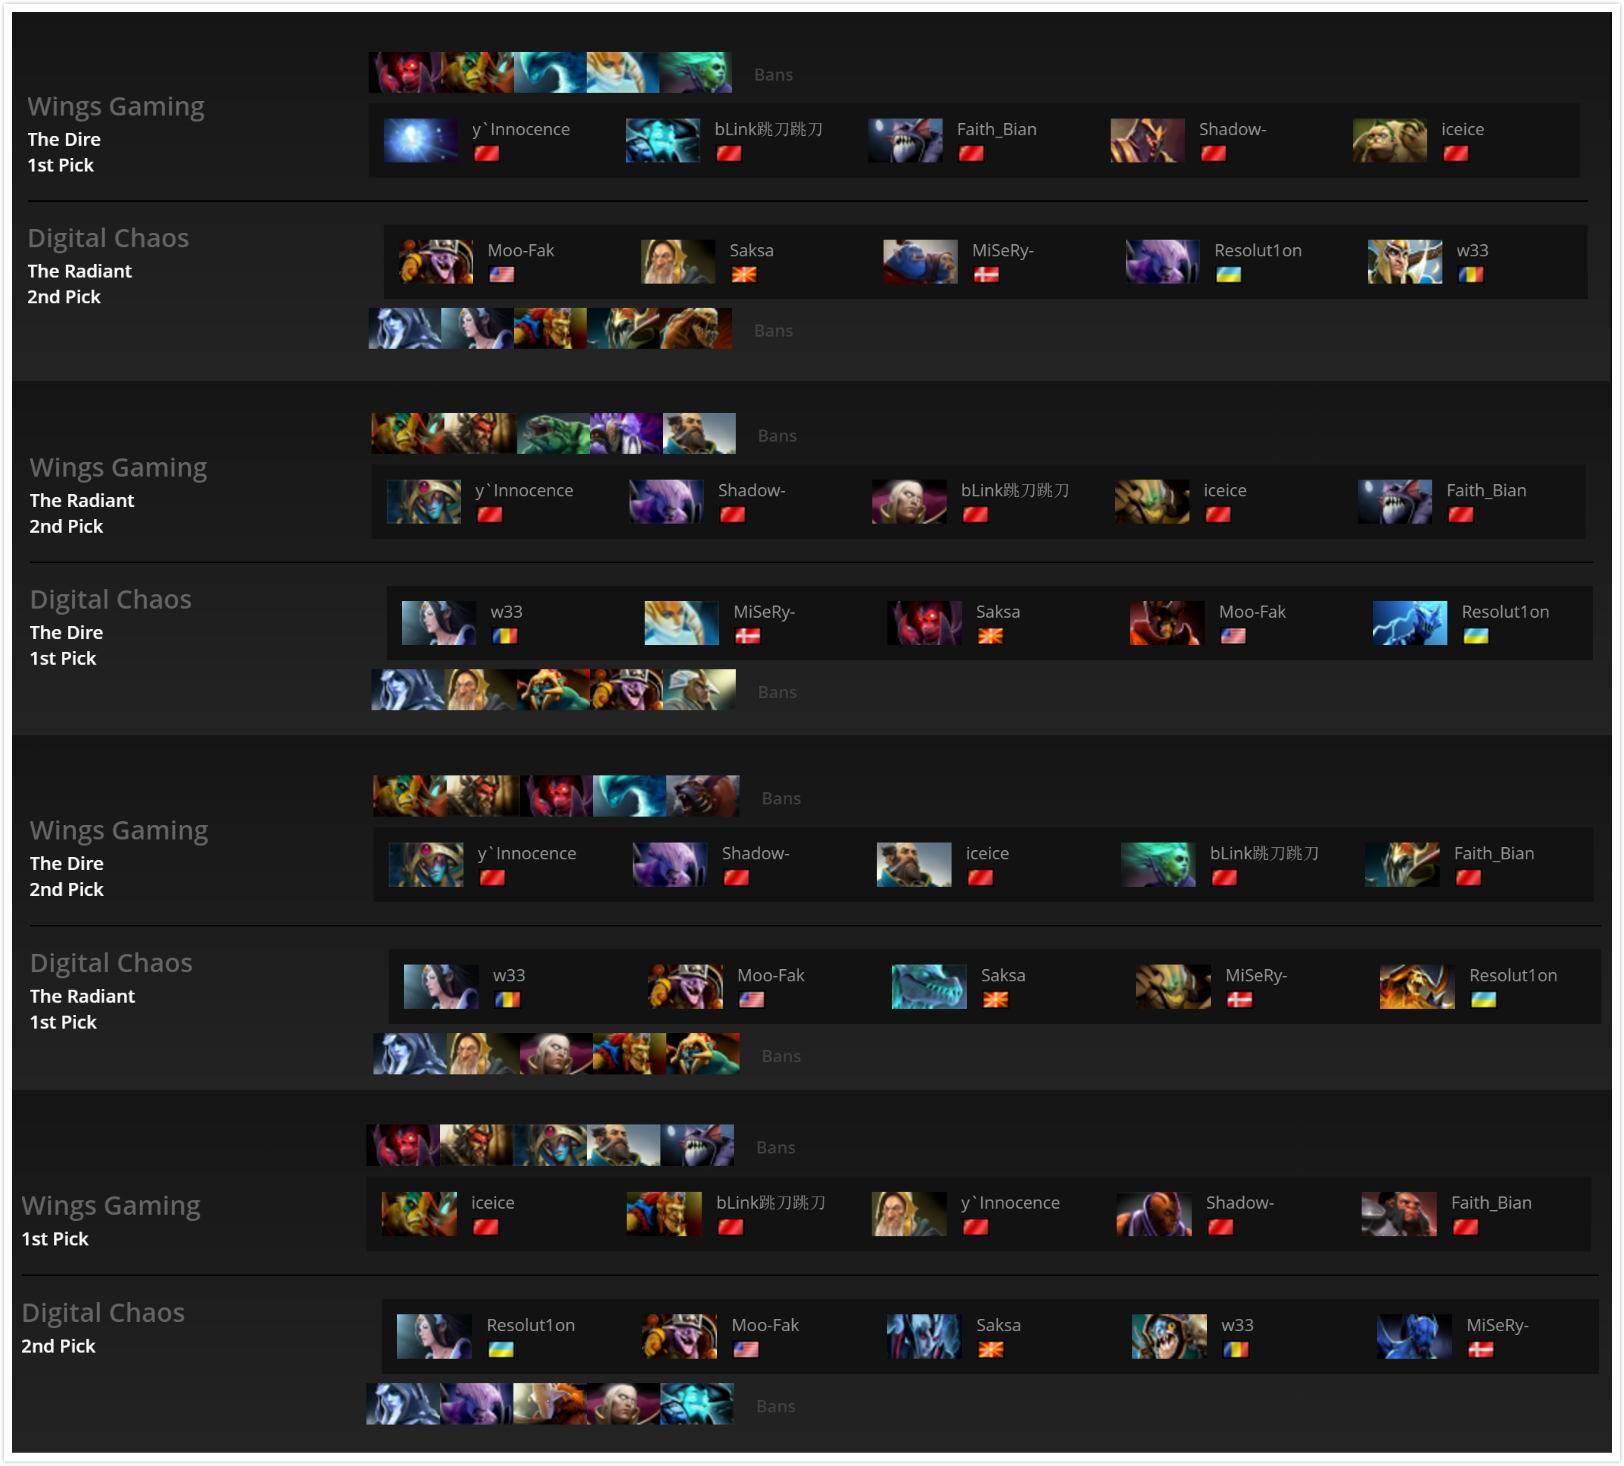 Wings 和 DC 在总决赛四局中的 Ban/Pick。Wings 第一局输,然后直落三局获胜